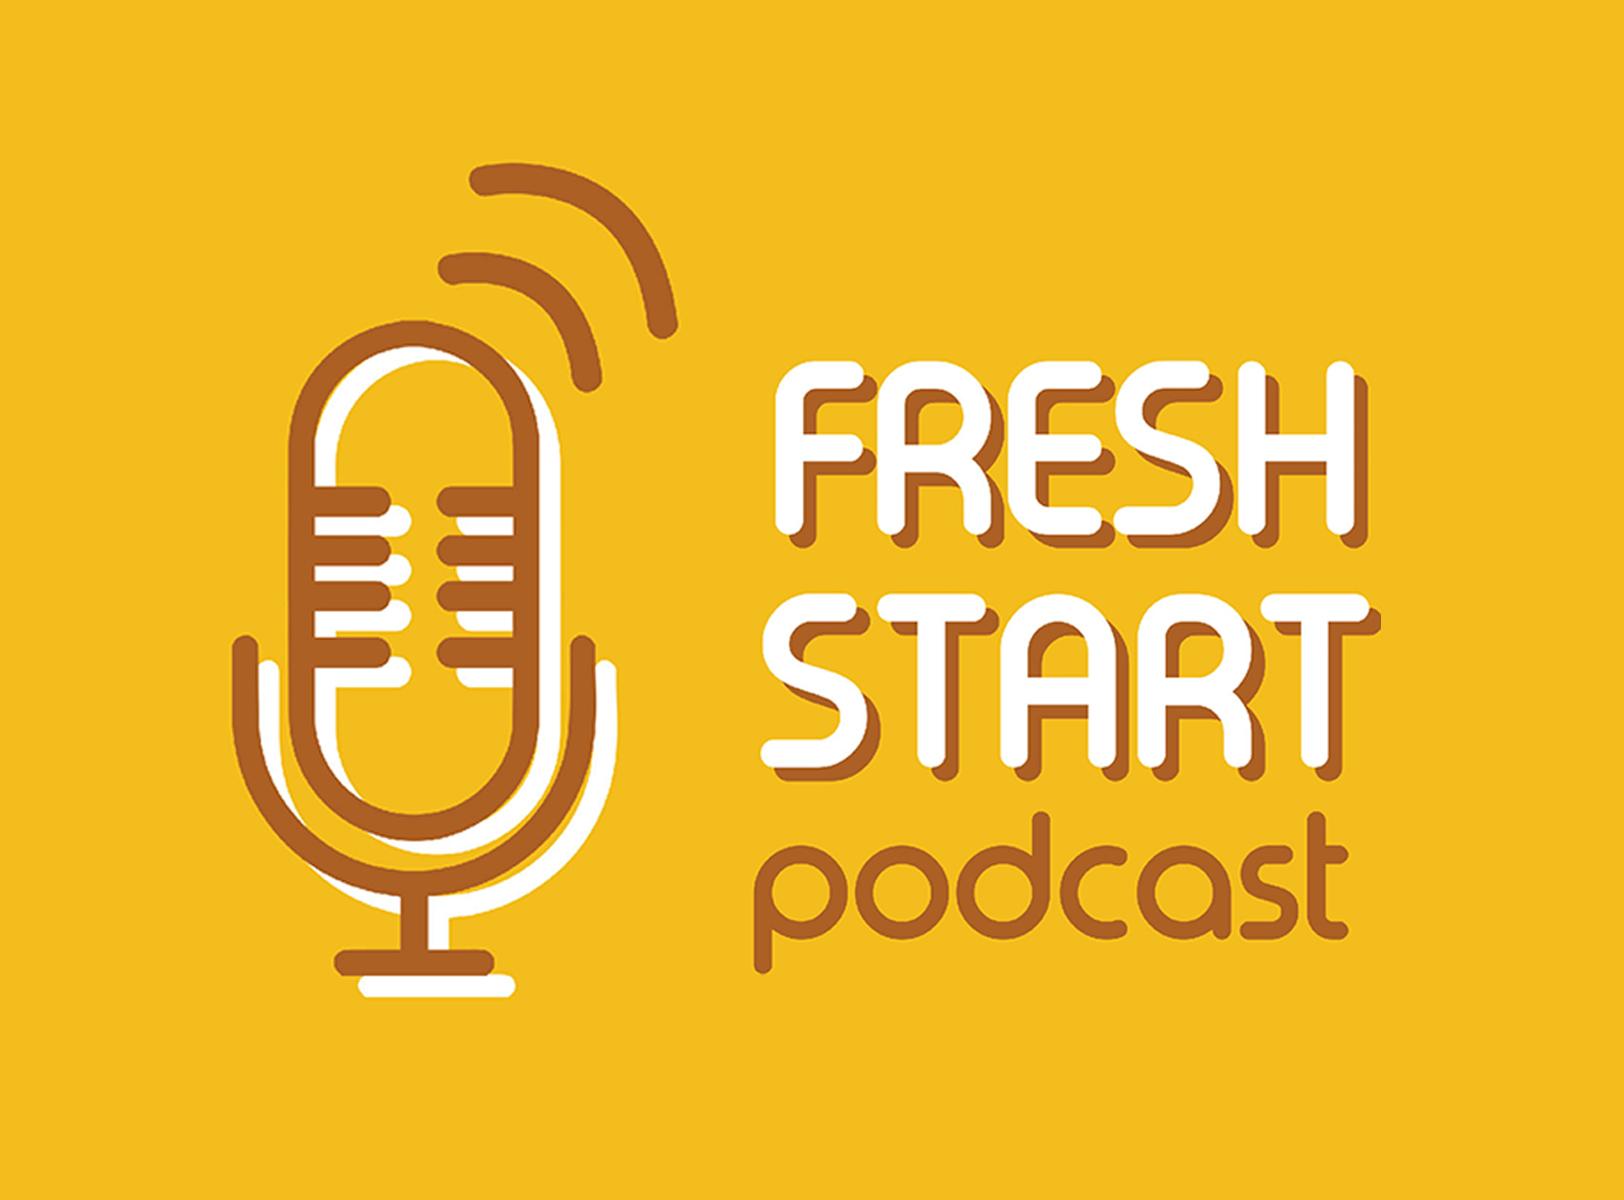 Fresh Start: Podcast News (3/25/2020 Wed.)